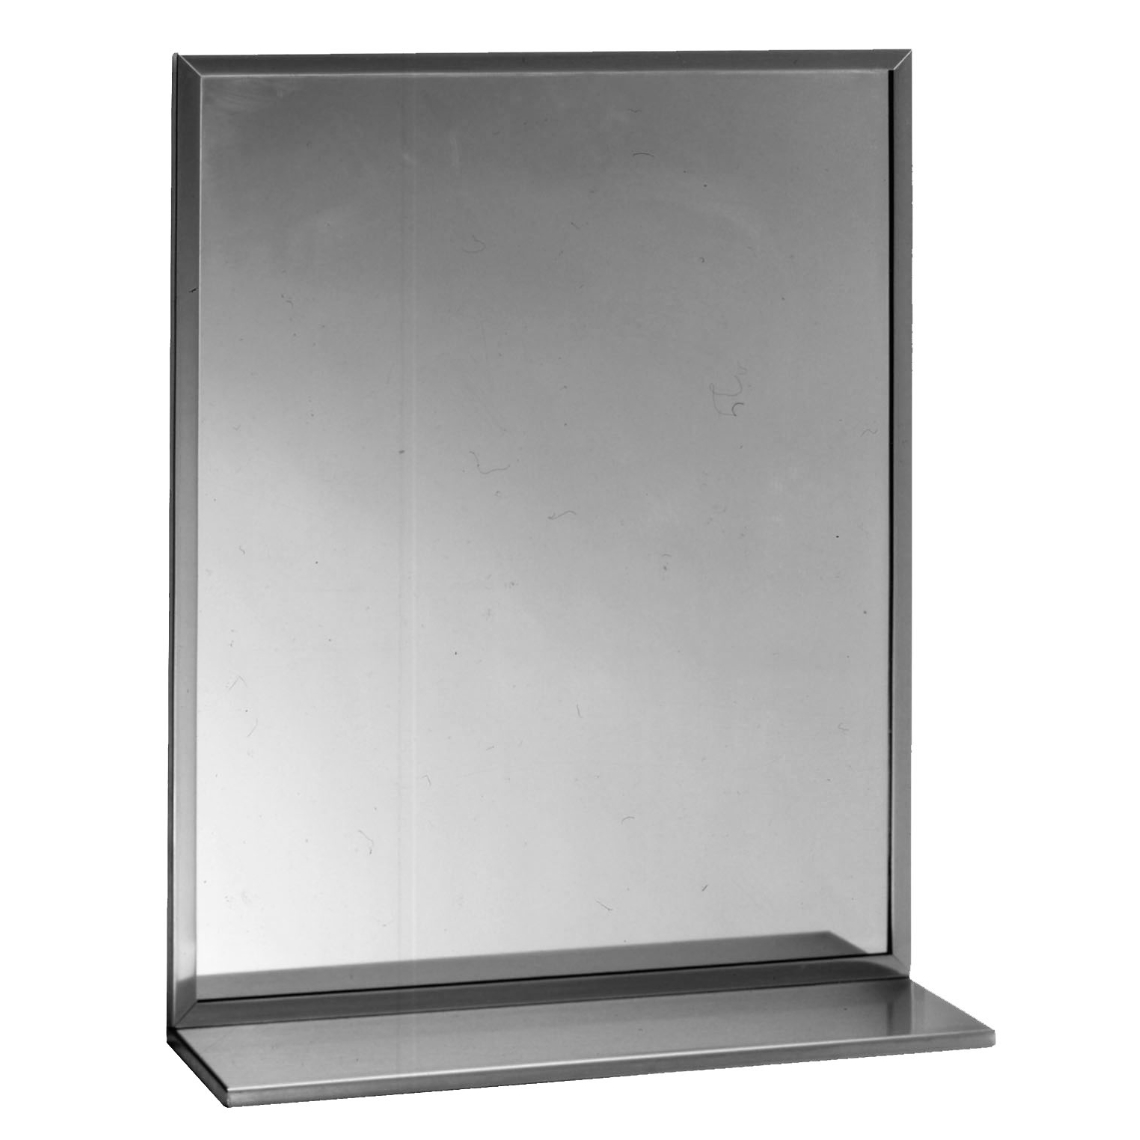 166 Channel Frame Mirror with Shelf